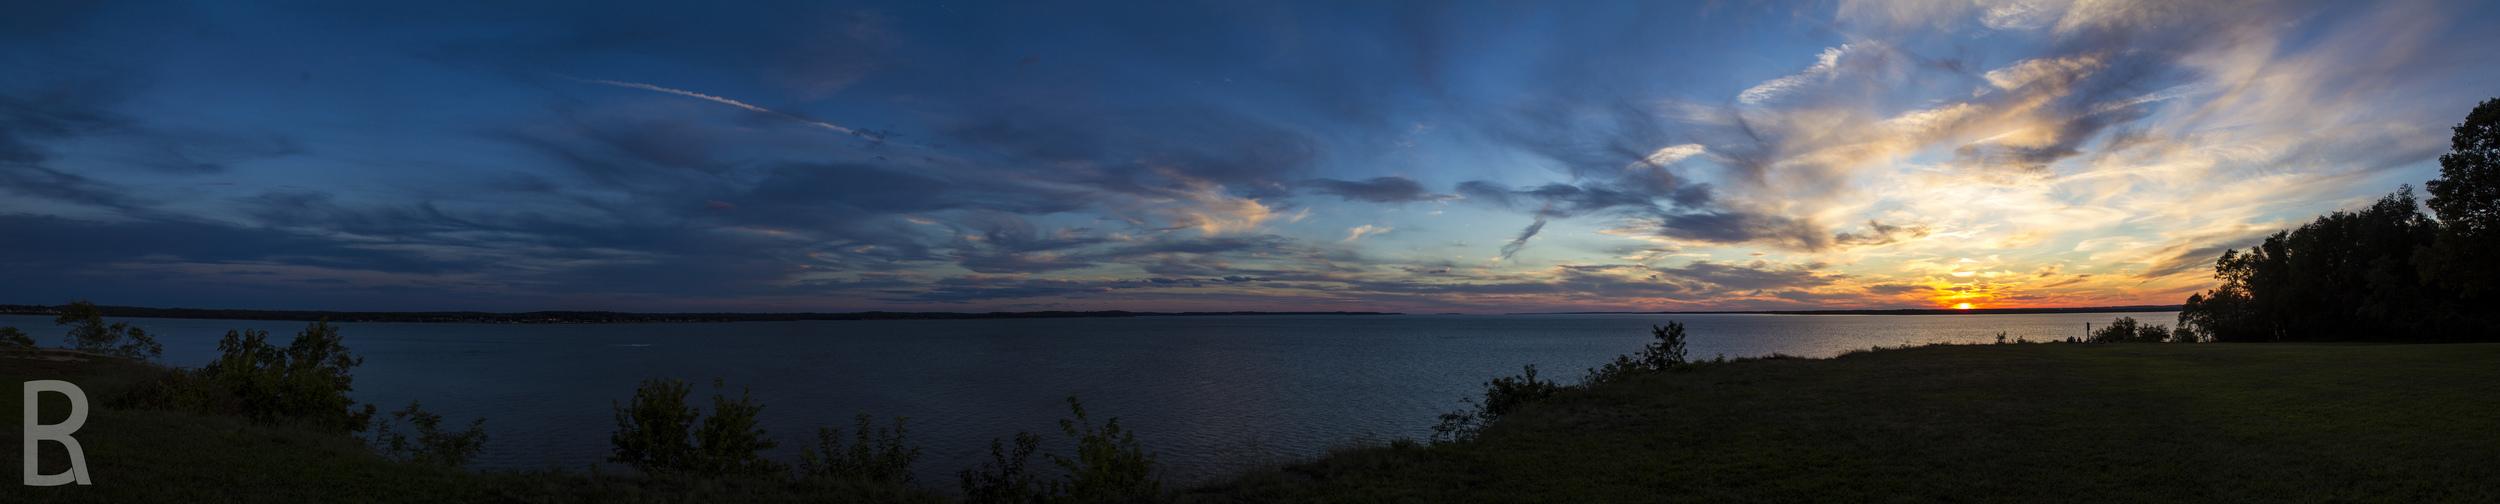 SITE-Chesapeake Bay-12.jpg